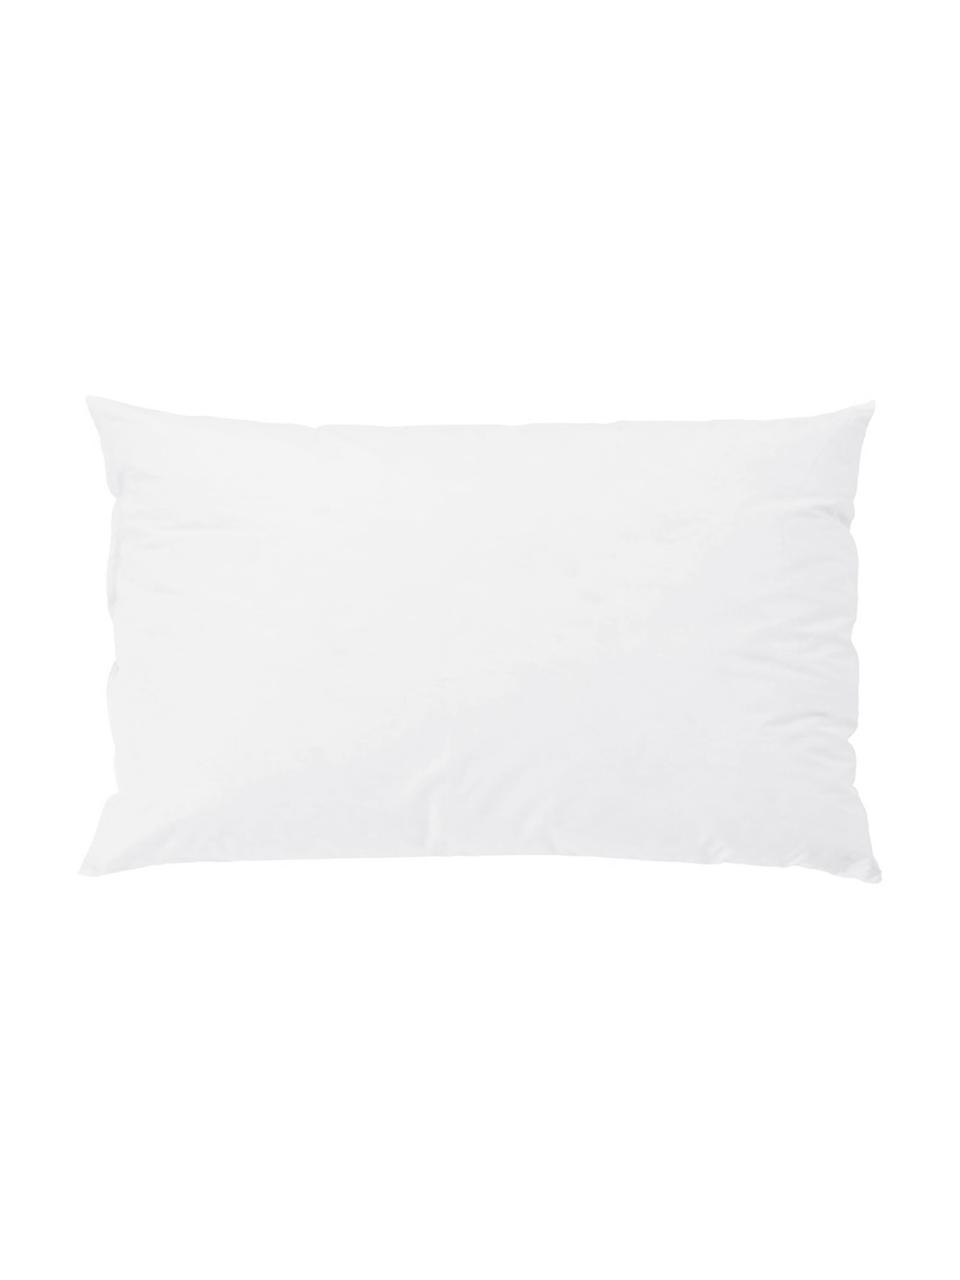 Imbottitura per cuscino in piume Comfort, 30 x 50, Bianco, Larg. 30 x Lung. 50 cm